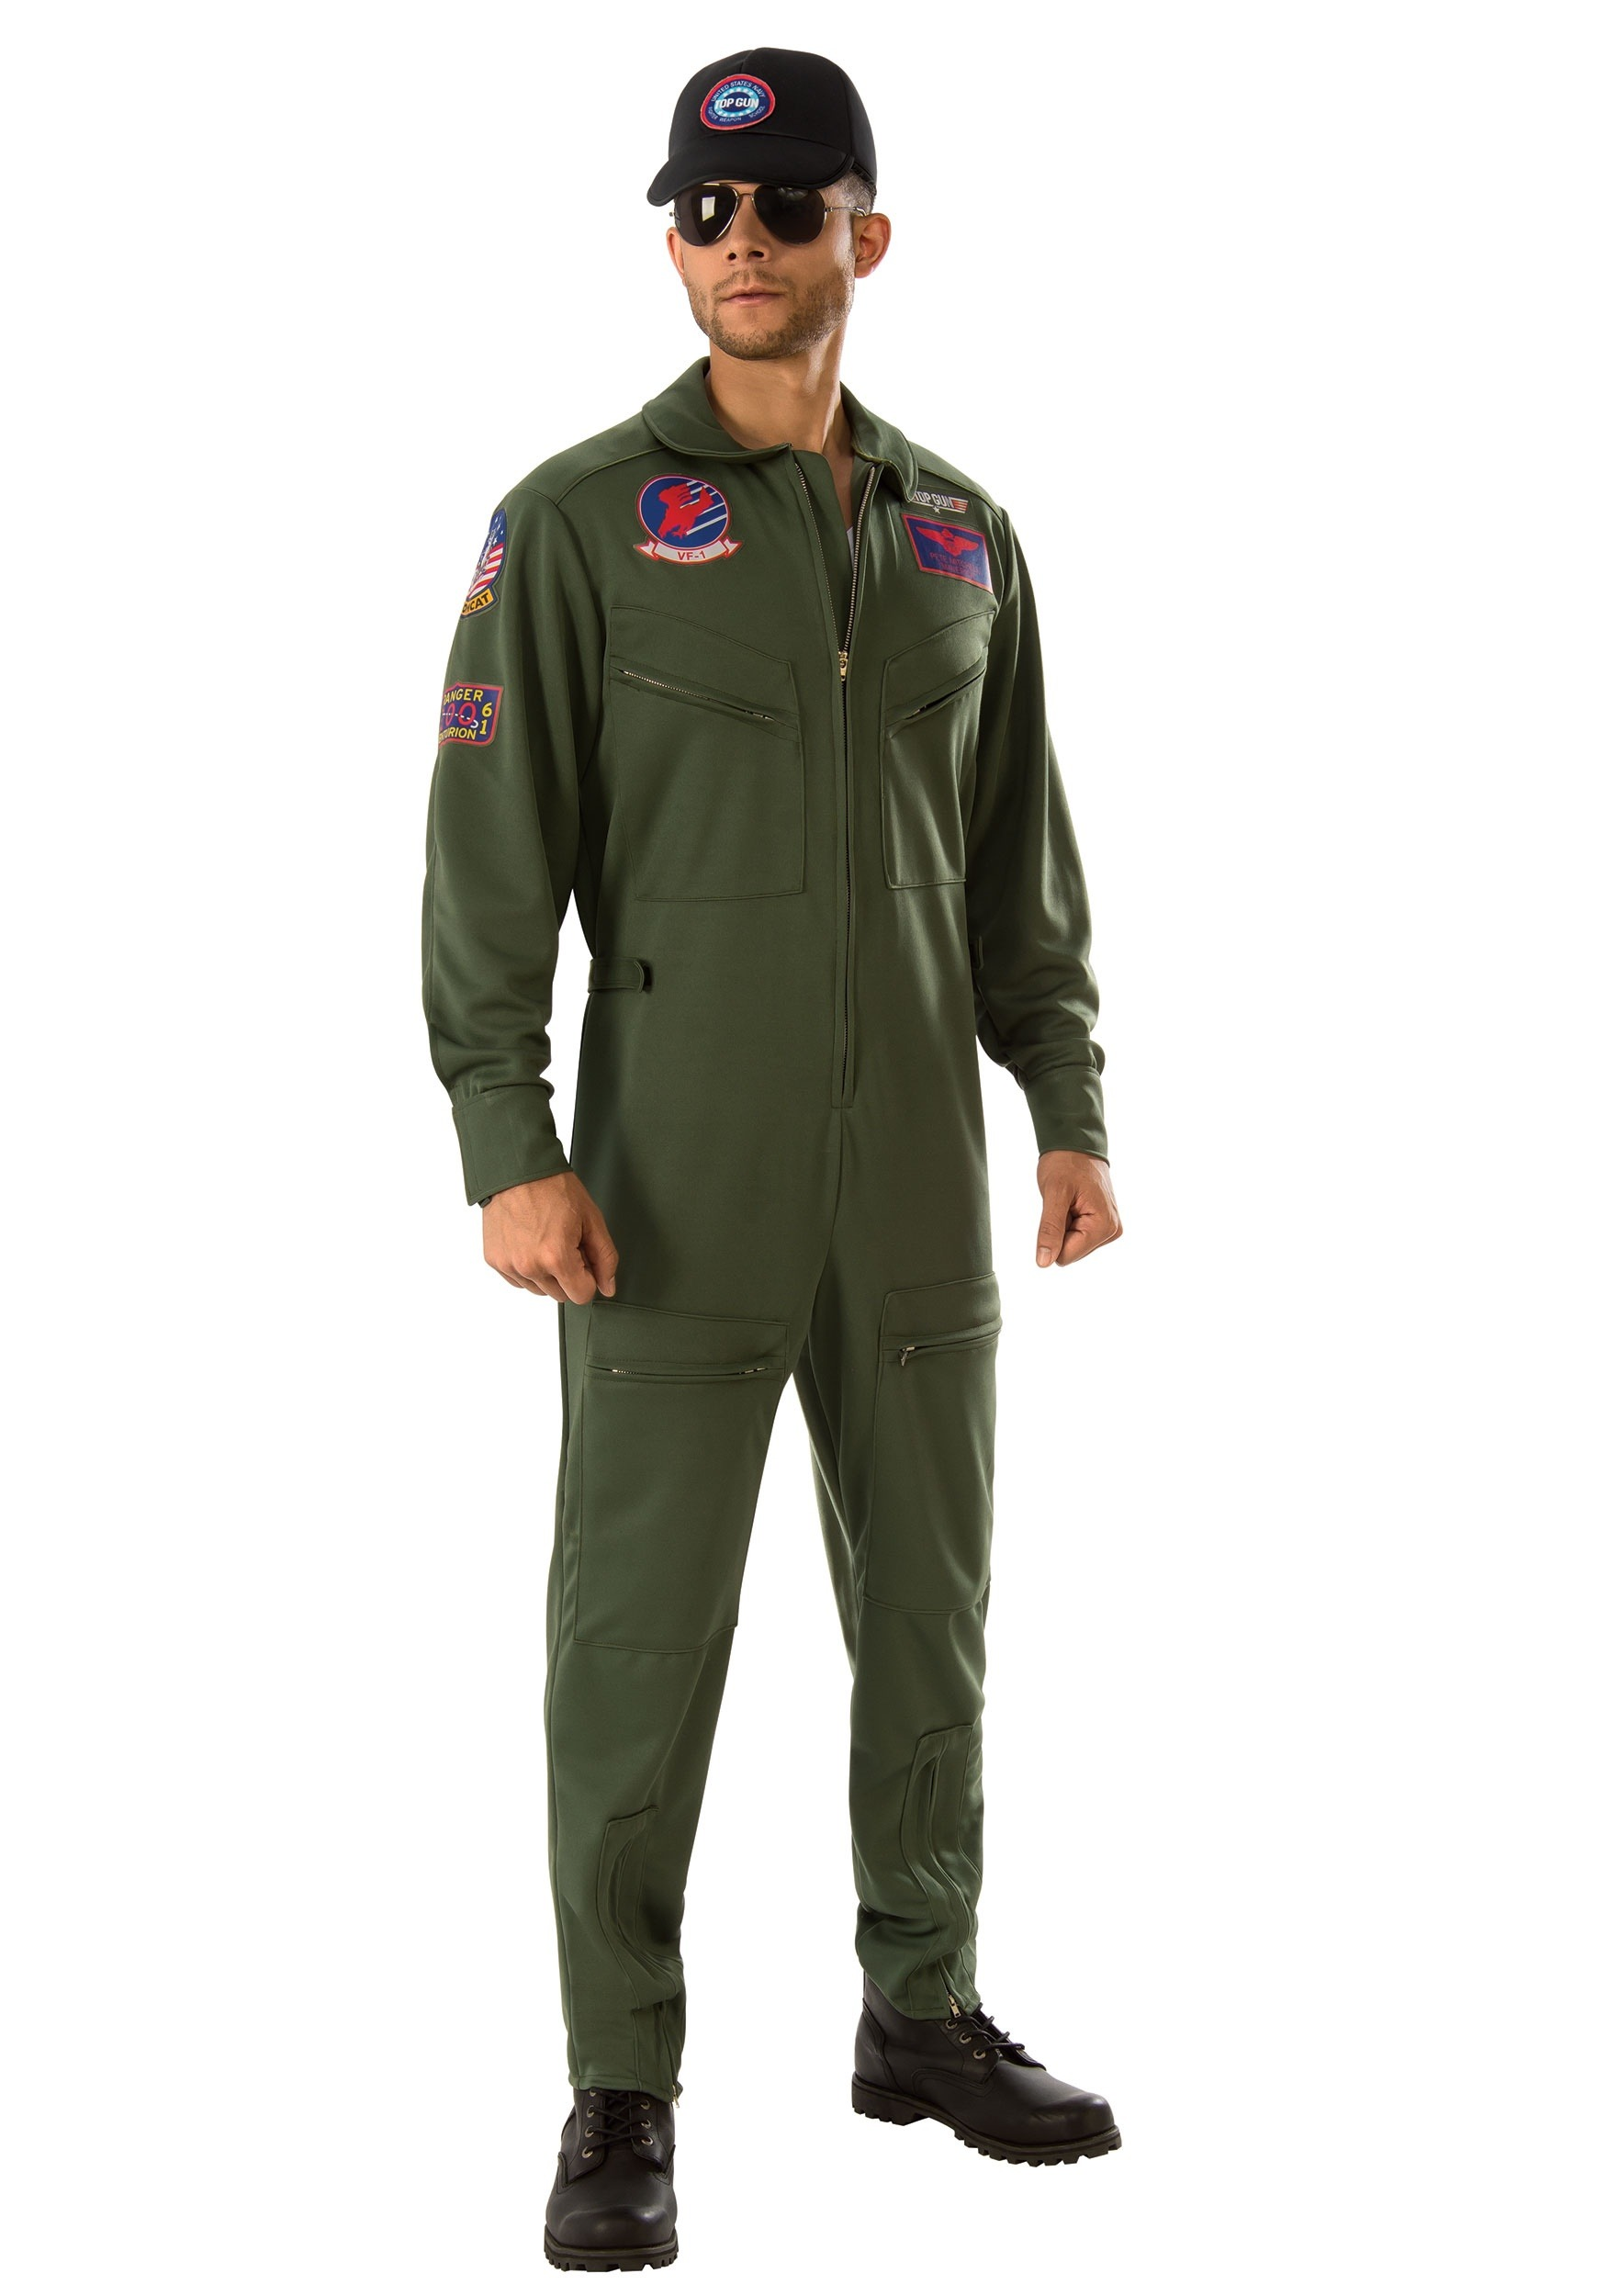 Top Gun Men's Jumpsuit Costume | Fighter Pilot Costume